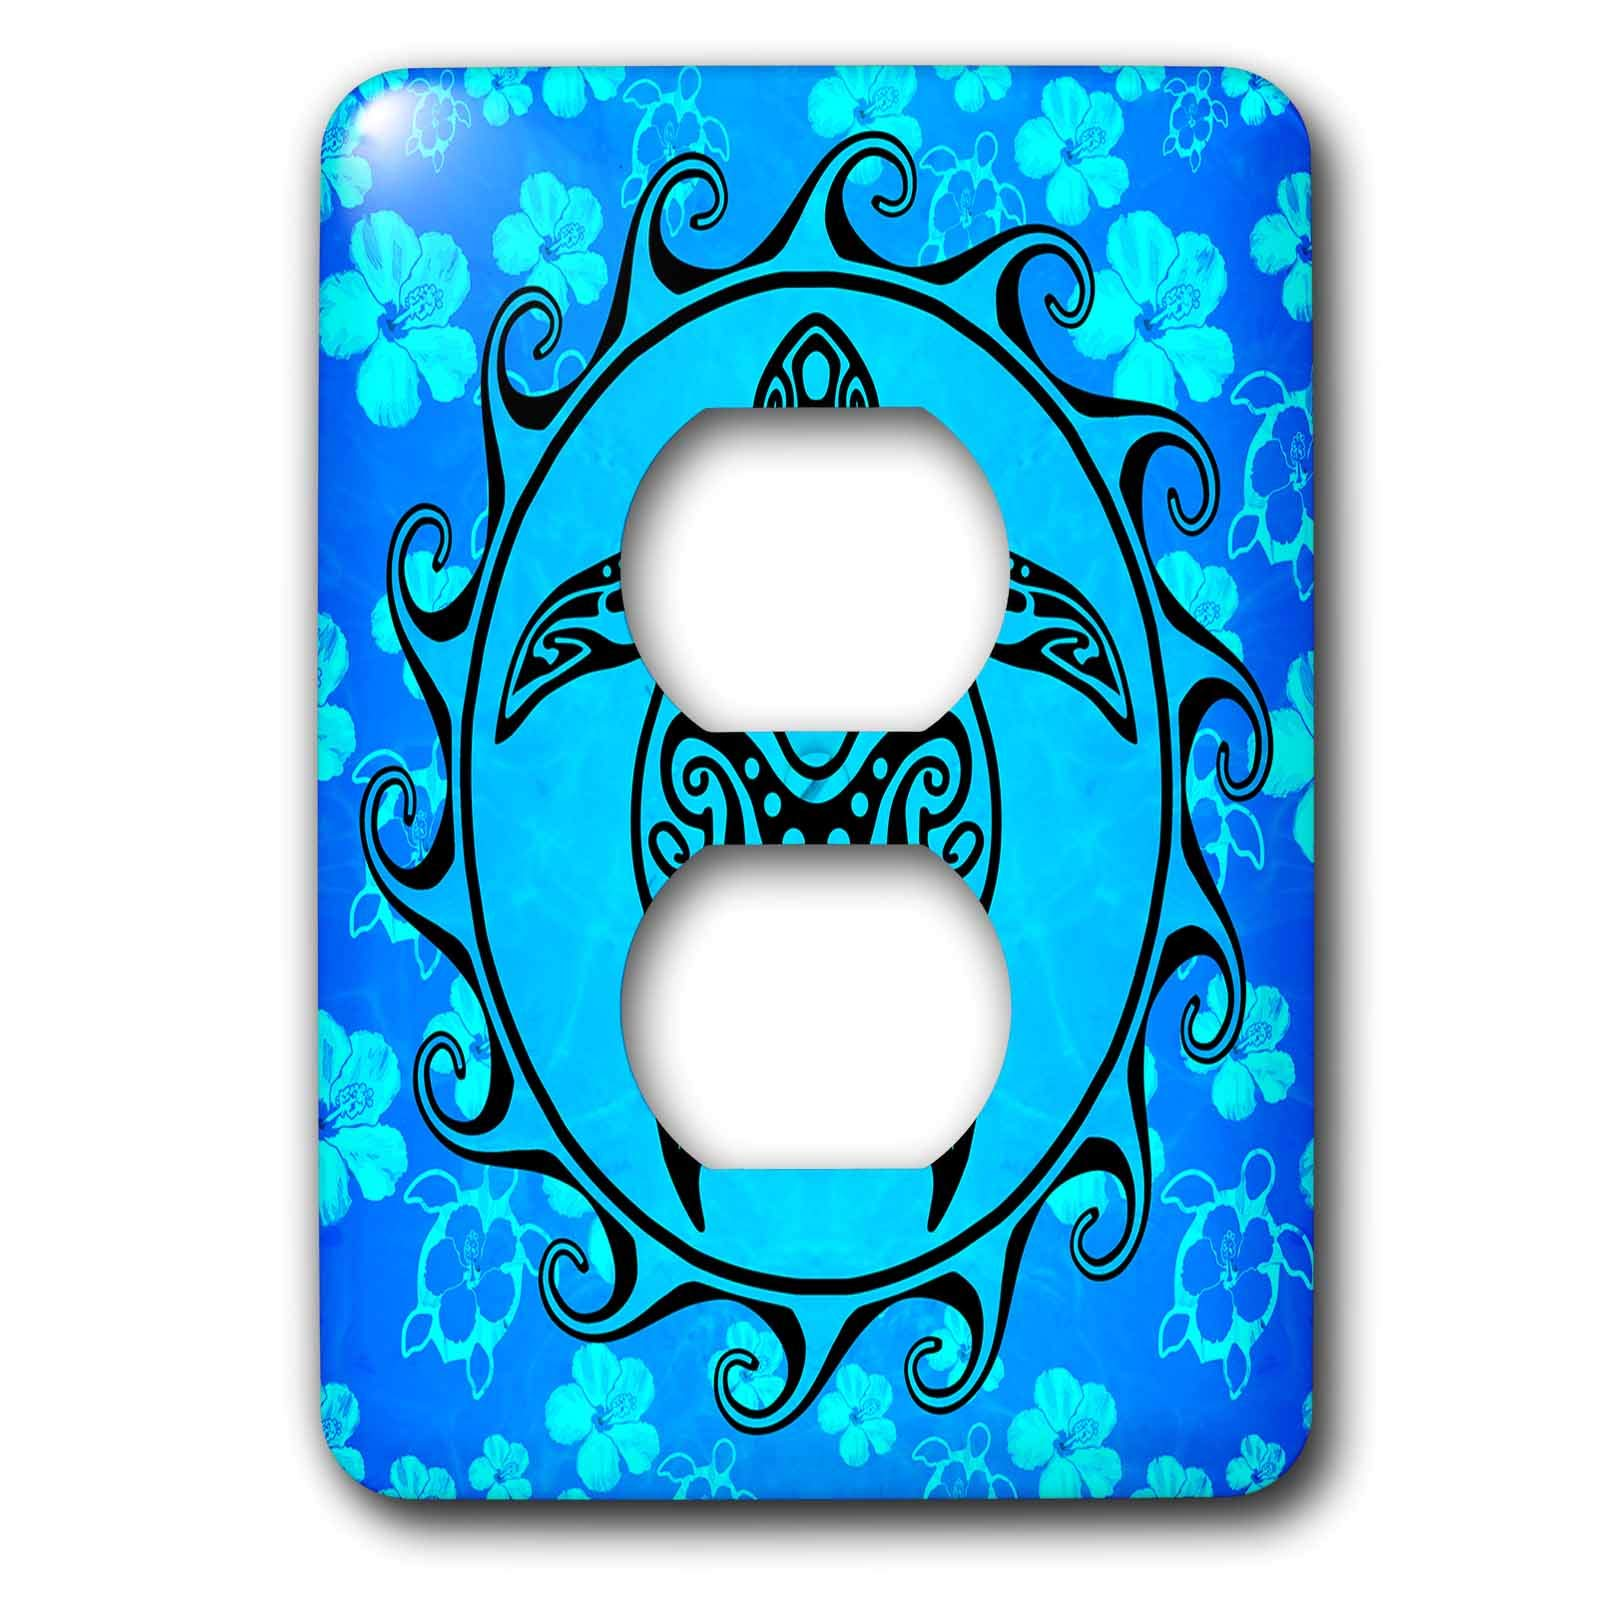 3dRose MacDonald Creative Studios – Tribal Animals - Ocean blue tribal sea turtle, Maori Sun Polynesian symbol and pattern. - Light Switch Covers - 2 plug outlet cover (lsp_295357_6)